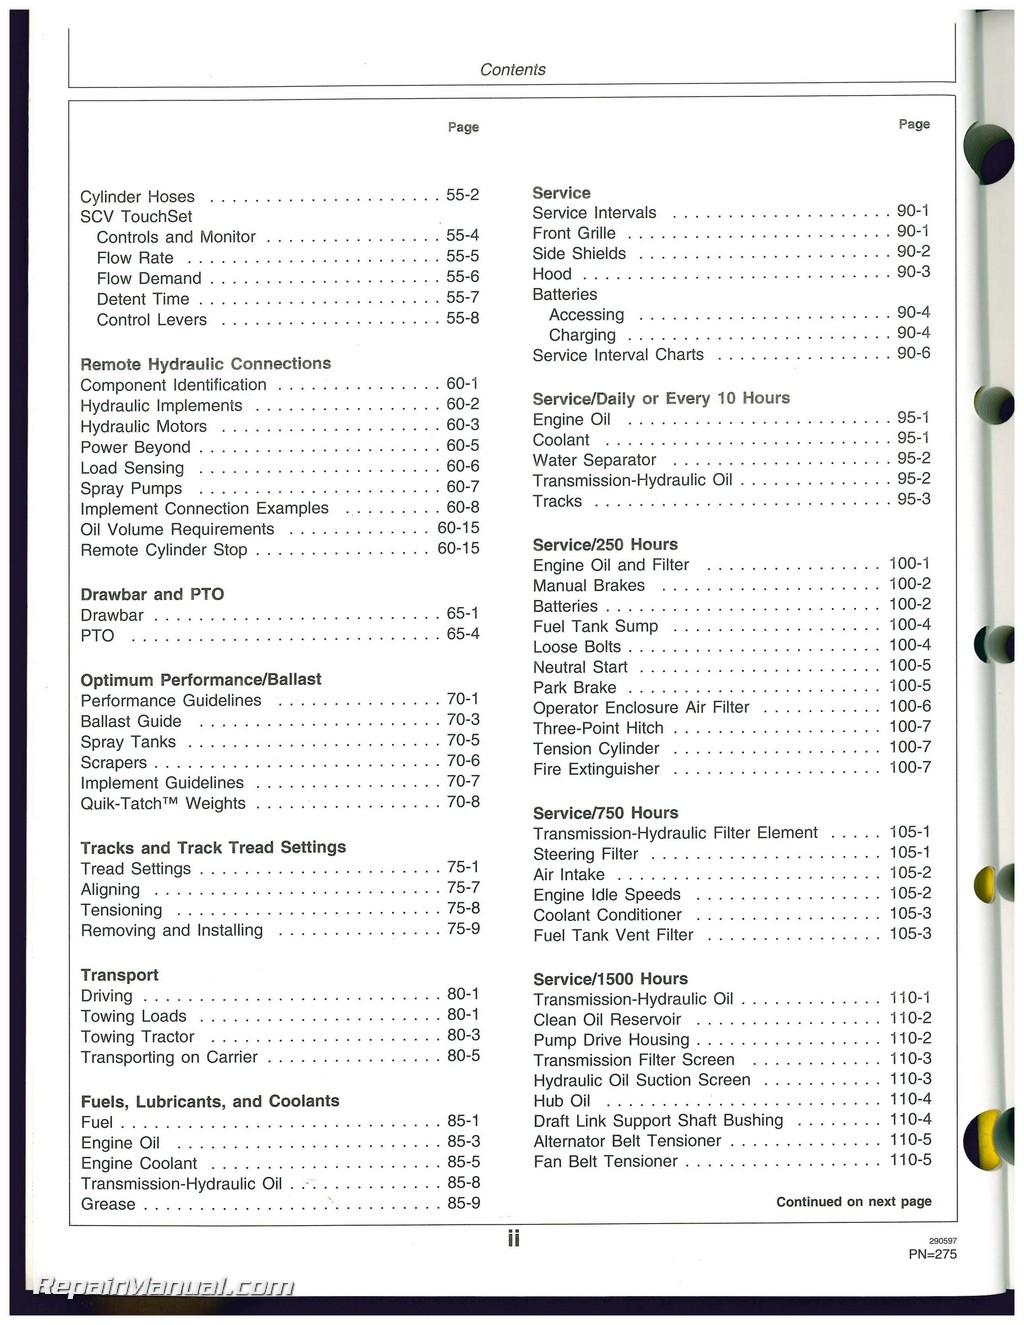 john deere 8300 service manual